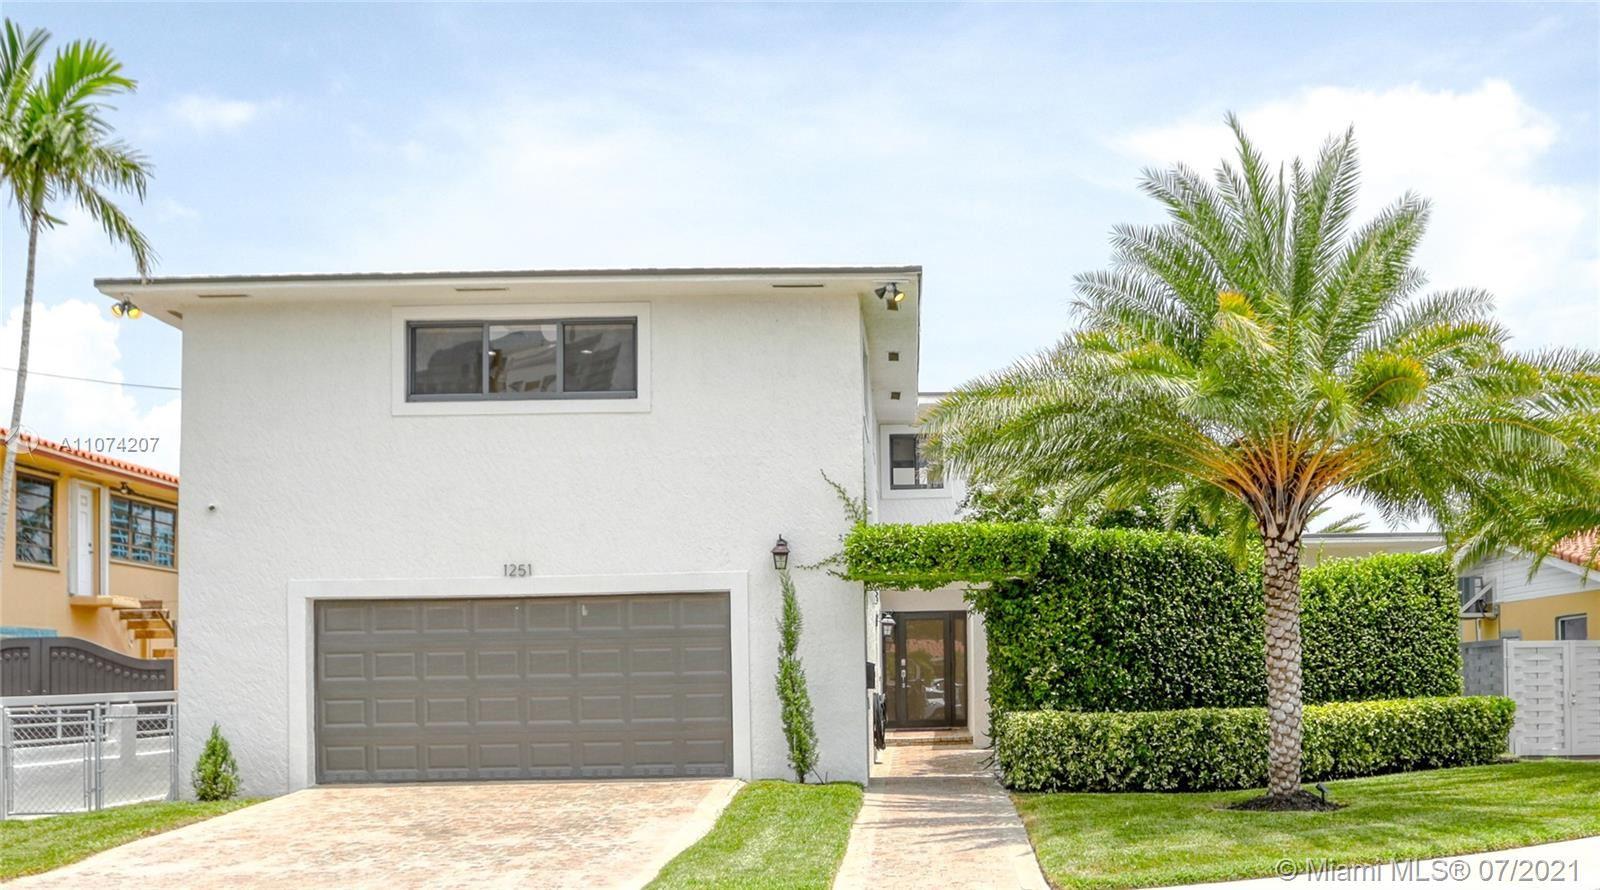 Photo of 1251 NE 82nd St, Miami, FL 33138 (MLS # A11074207)